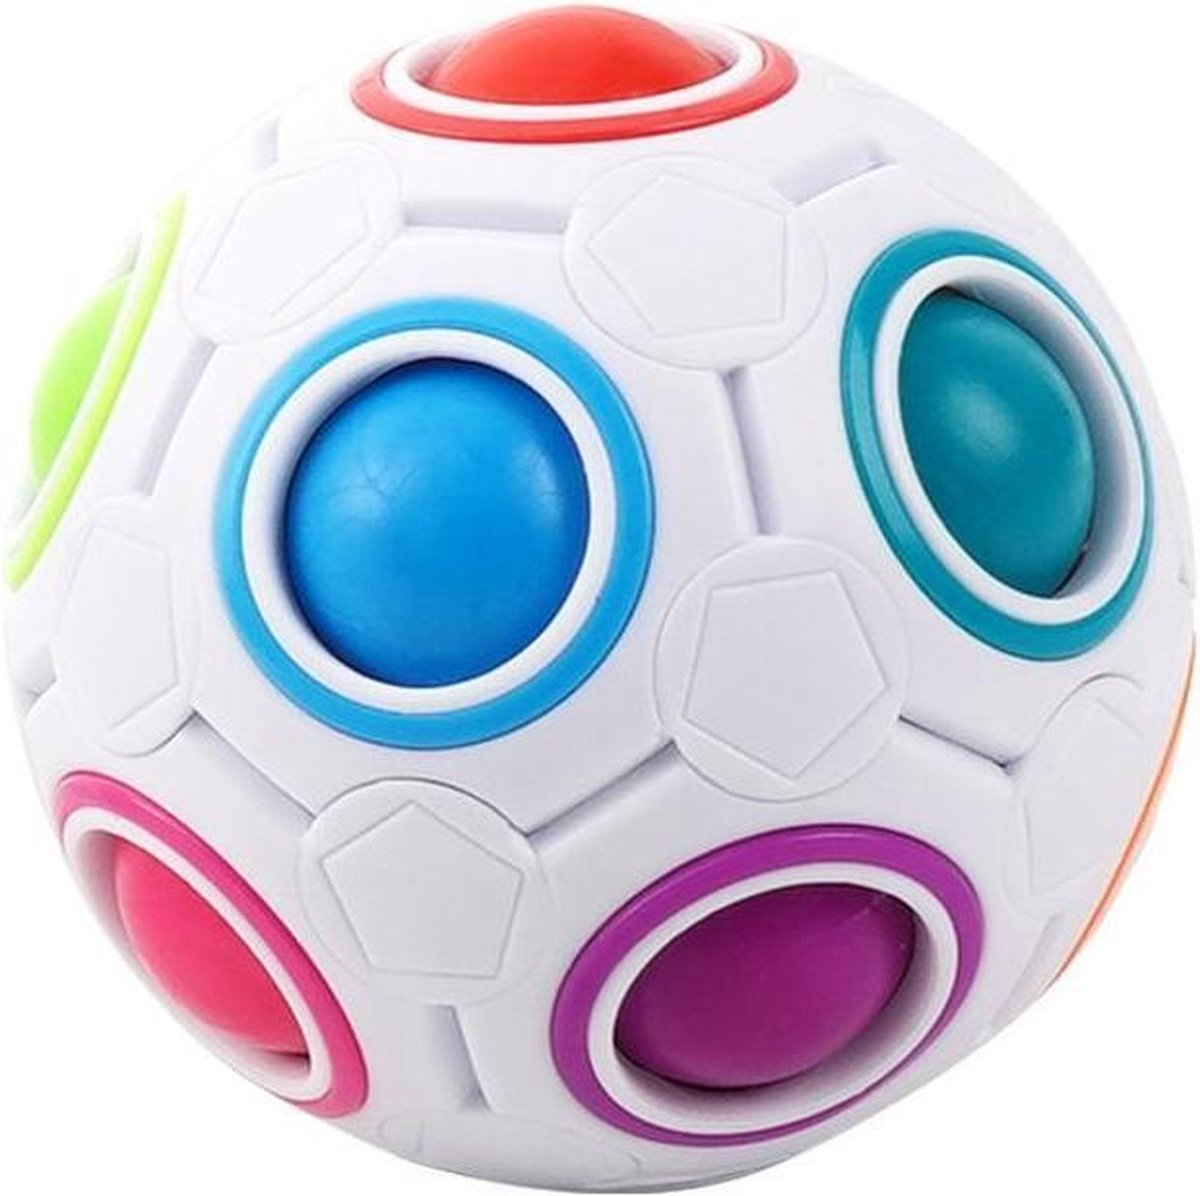 Fidget Bal Puzzel | Speelgoed | Rage | Puzzel Ball | Stress Bal | Friemel Puzzel Bal | Nieuw Model Fidget | Fidget Puzzle Ball